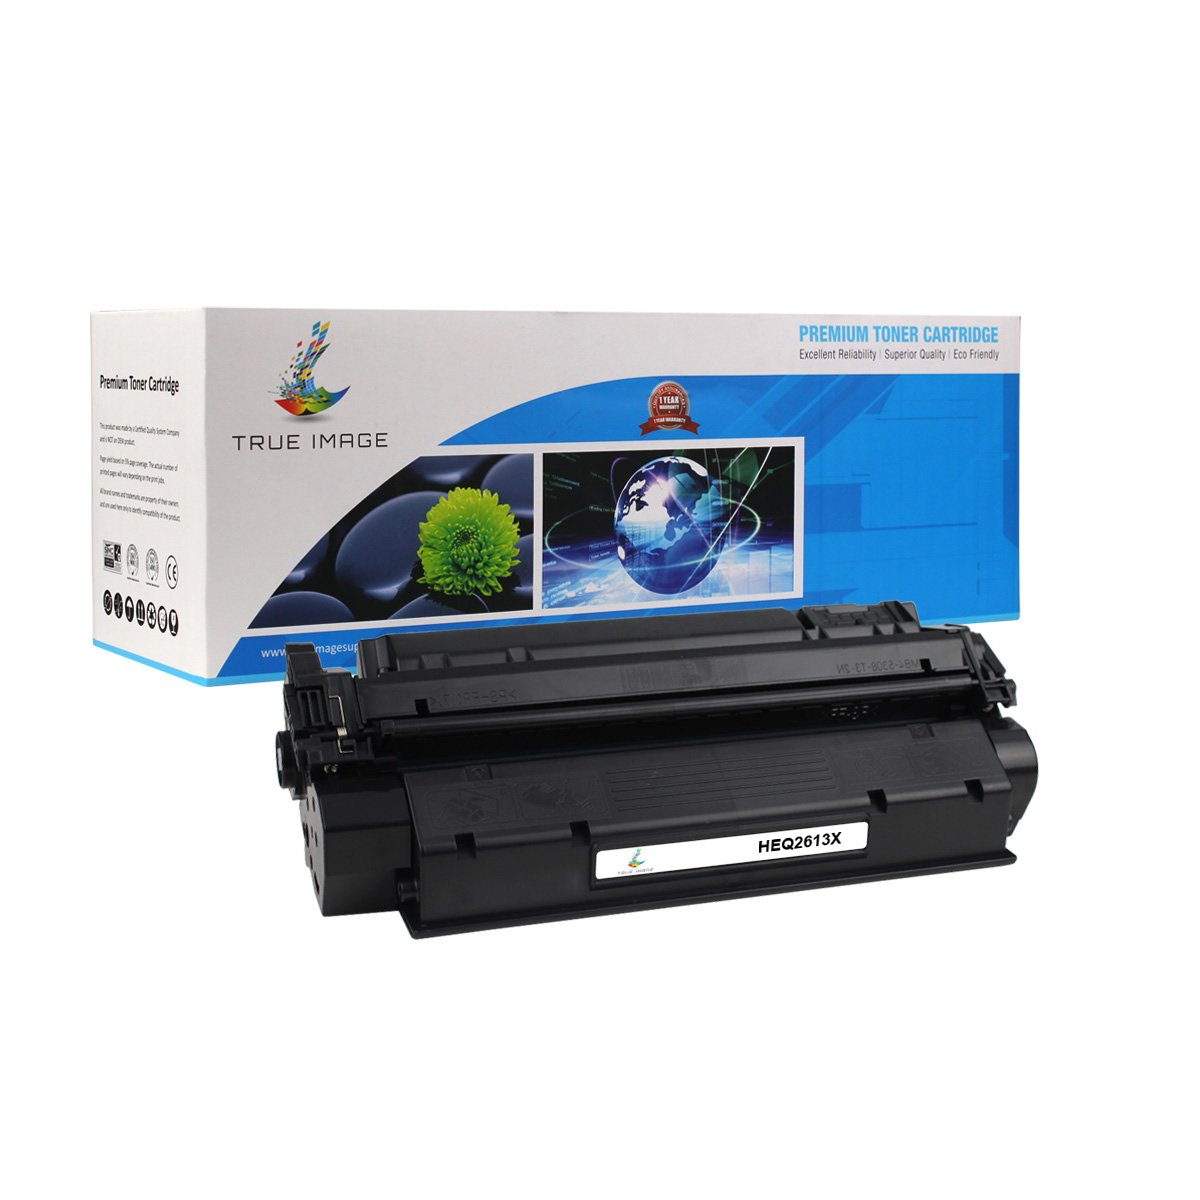 True Image Compatible Q2613X Q2613A 13A 13X Toner Cartridge Ink laserjet 1300 Toner for Laserjet 1300 1300N 1300XI Printer (Black, 1 Pack)